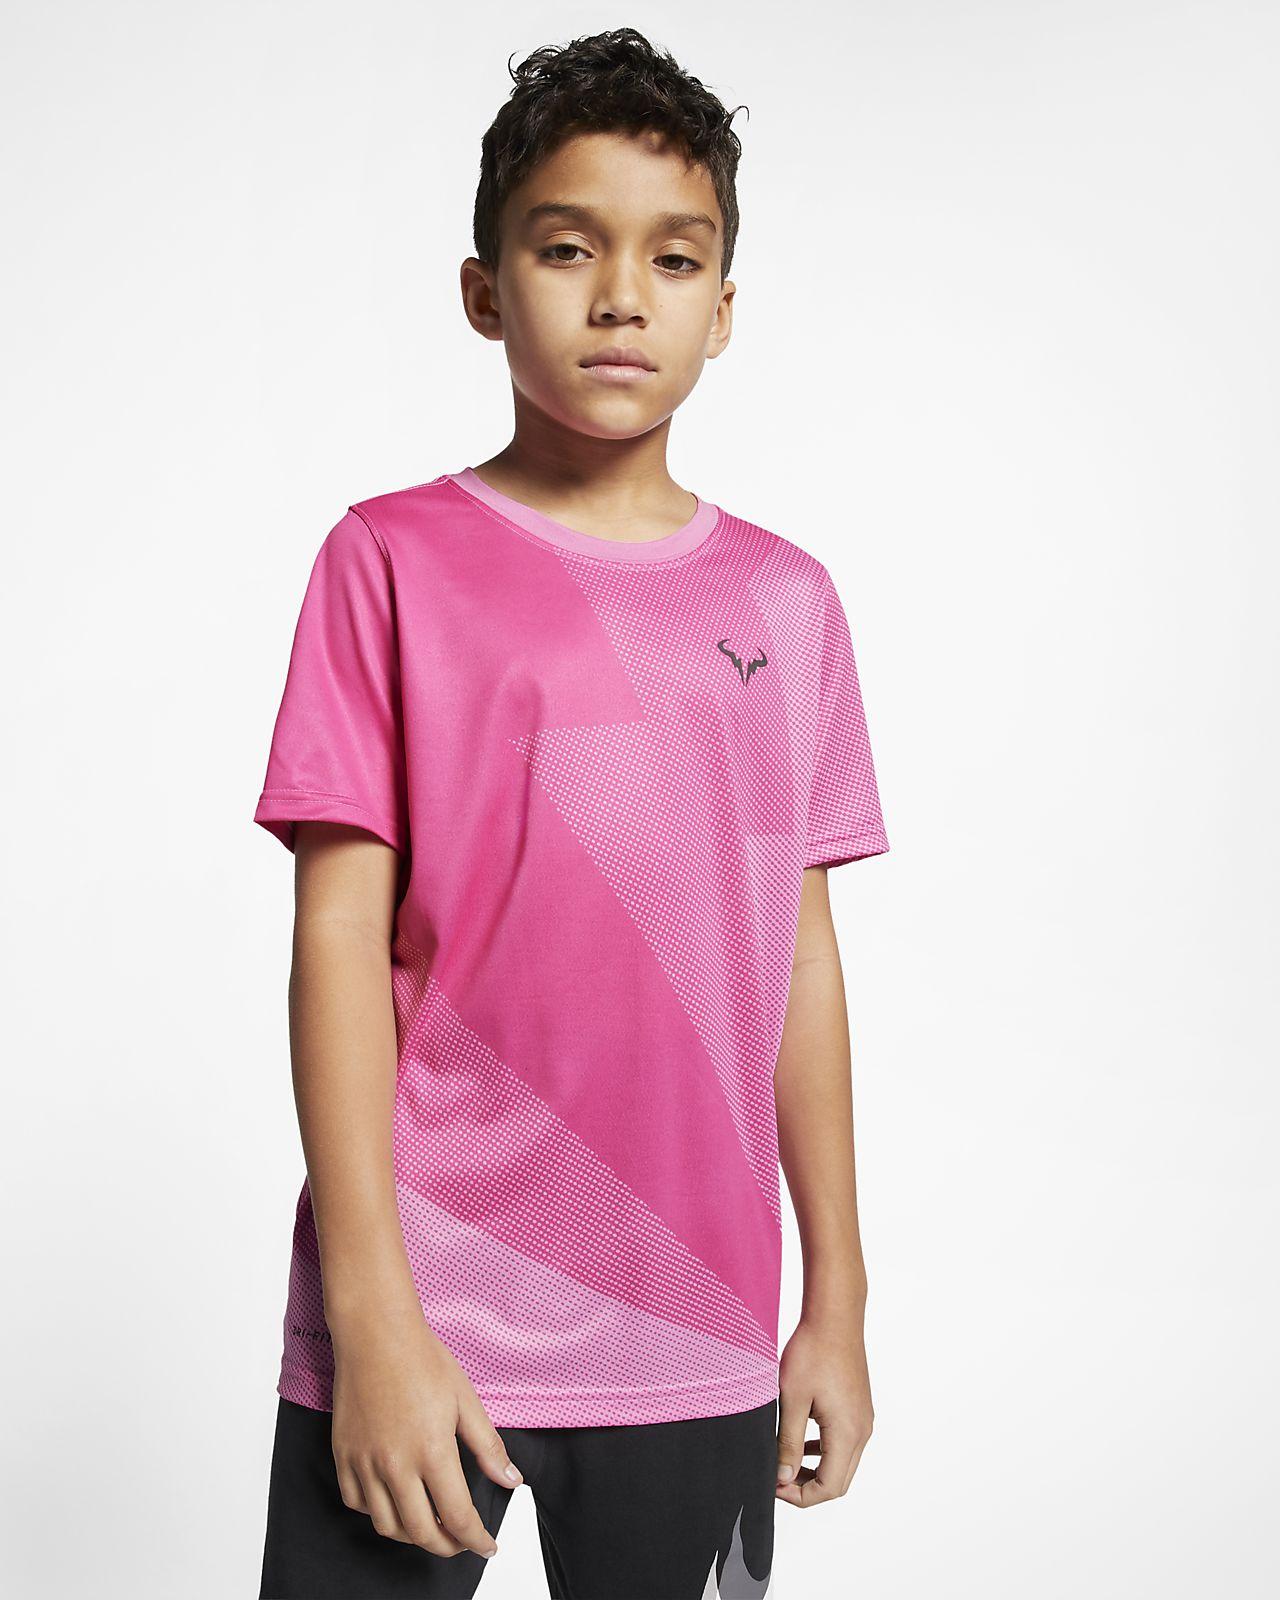 25ee2b43f7 Rafa Big Kids' (Boys') Tennis T-Shirt